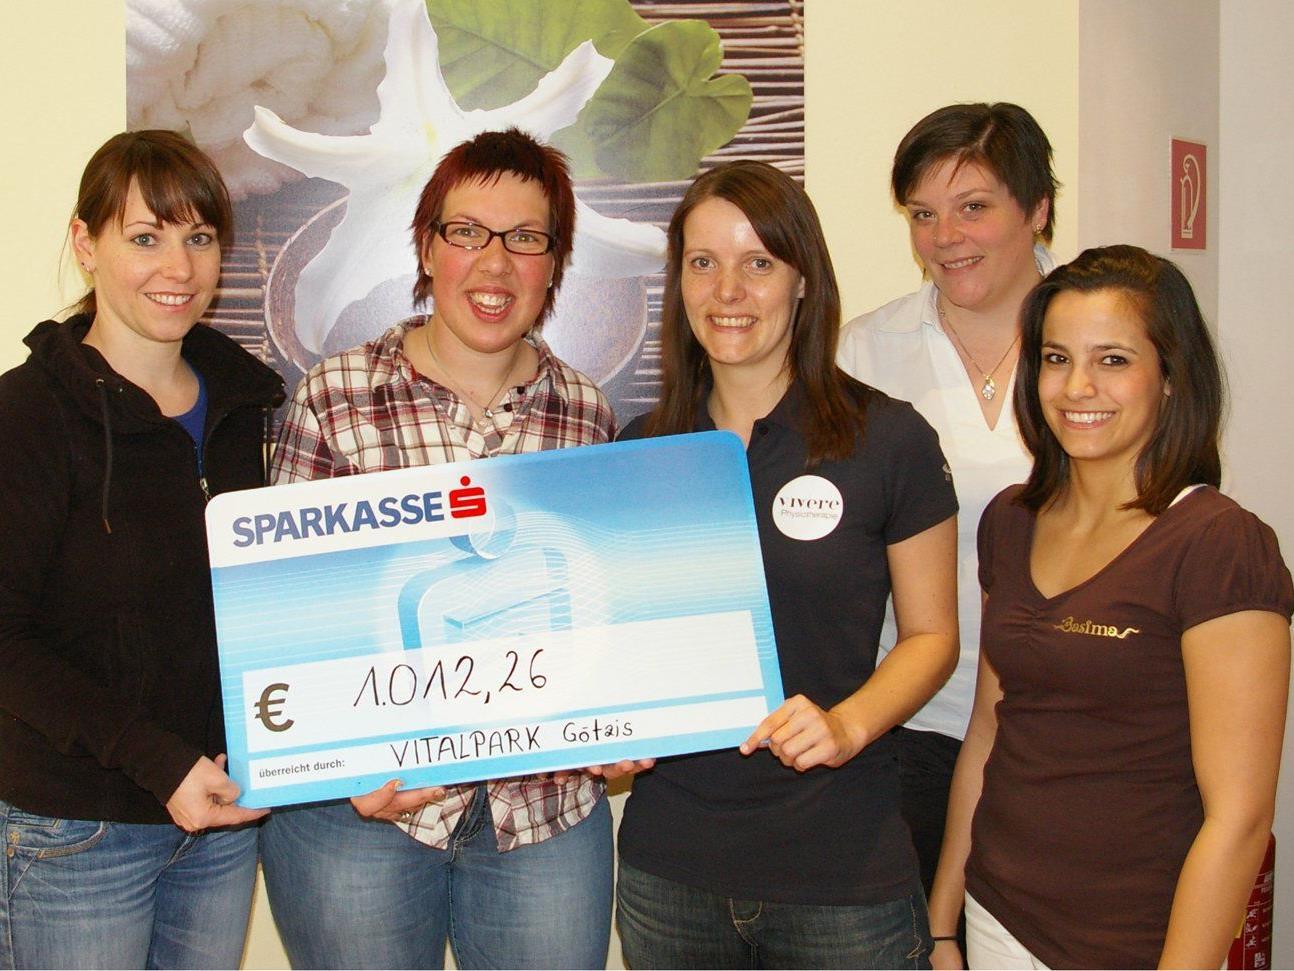 single in Gtzis - Bekanntschaften - Partnersuche & Kontakte